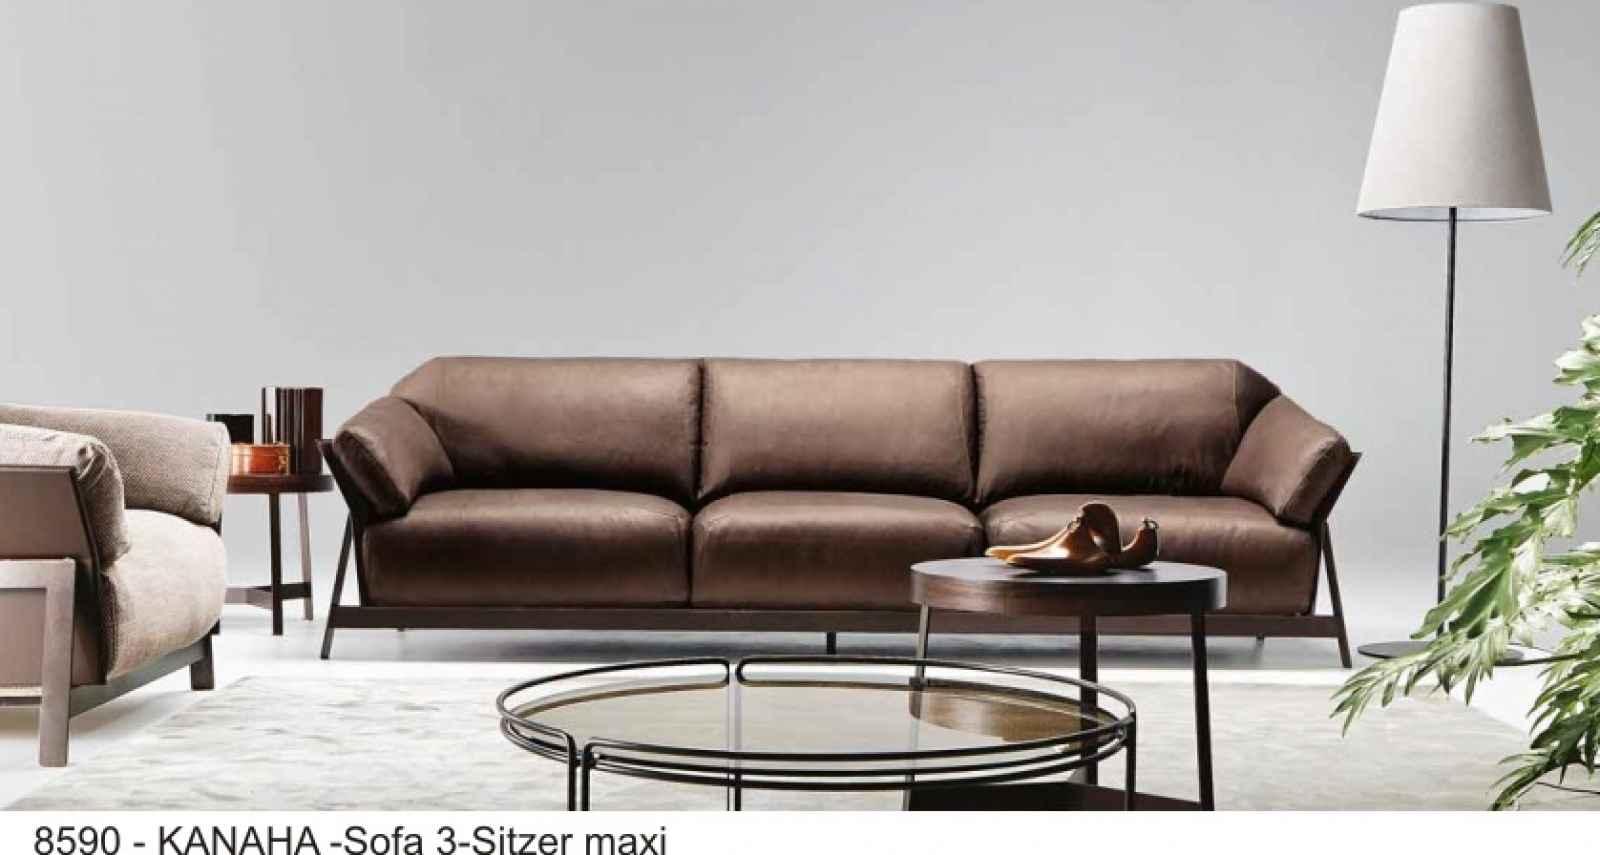 Ledersofa italienisches design  Designsofas - die Design-Lounge - the-lounge-company